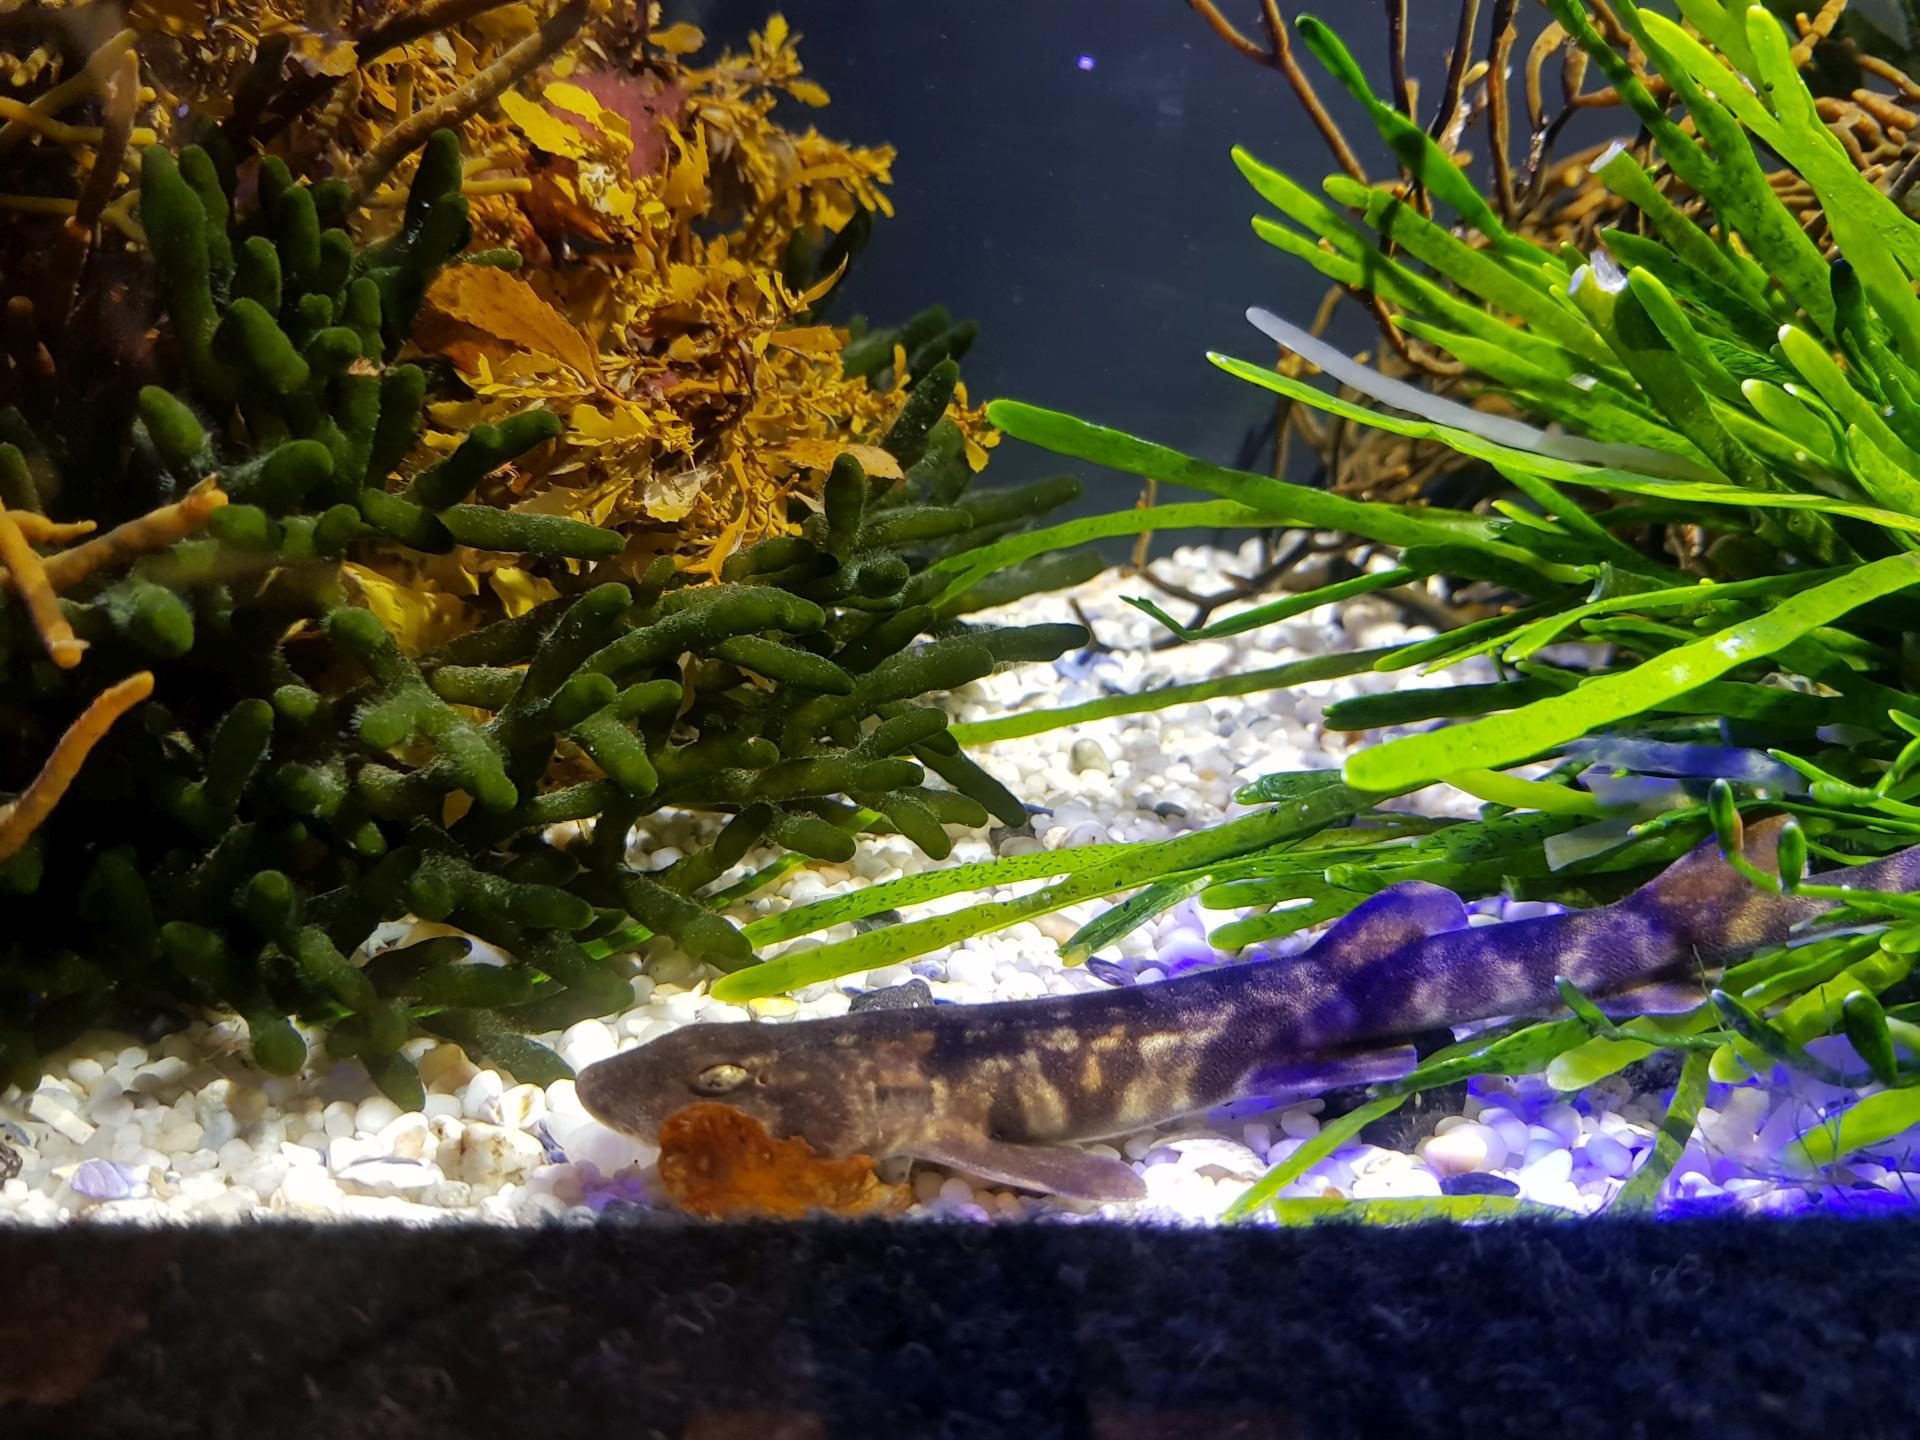 рыбы в аквариуме, Кейптаун